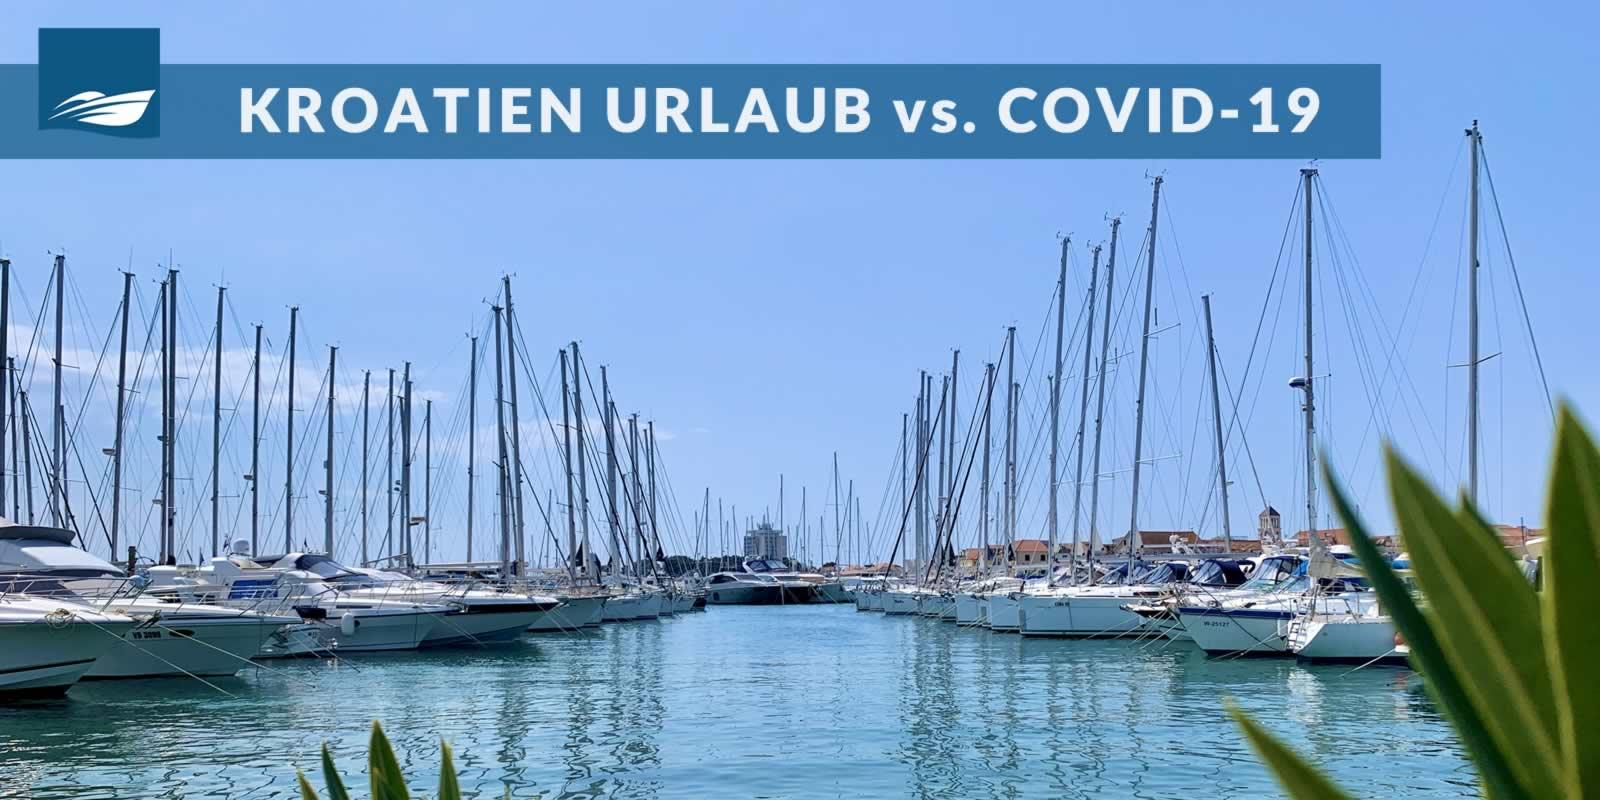 Kroatien Urlaub vs COVID-19